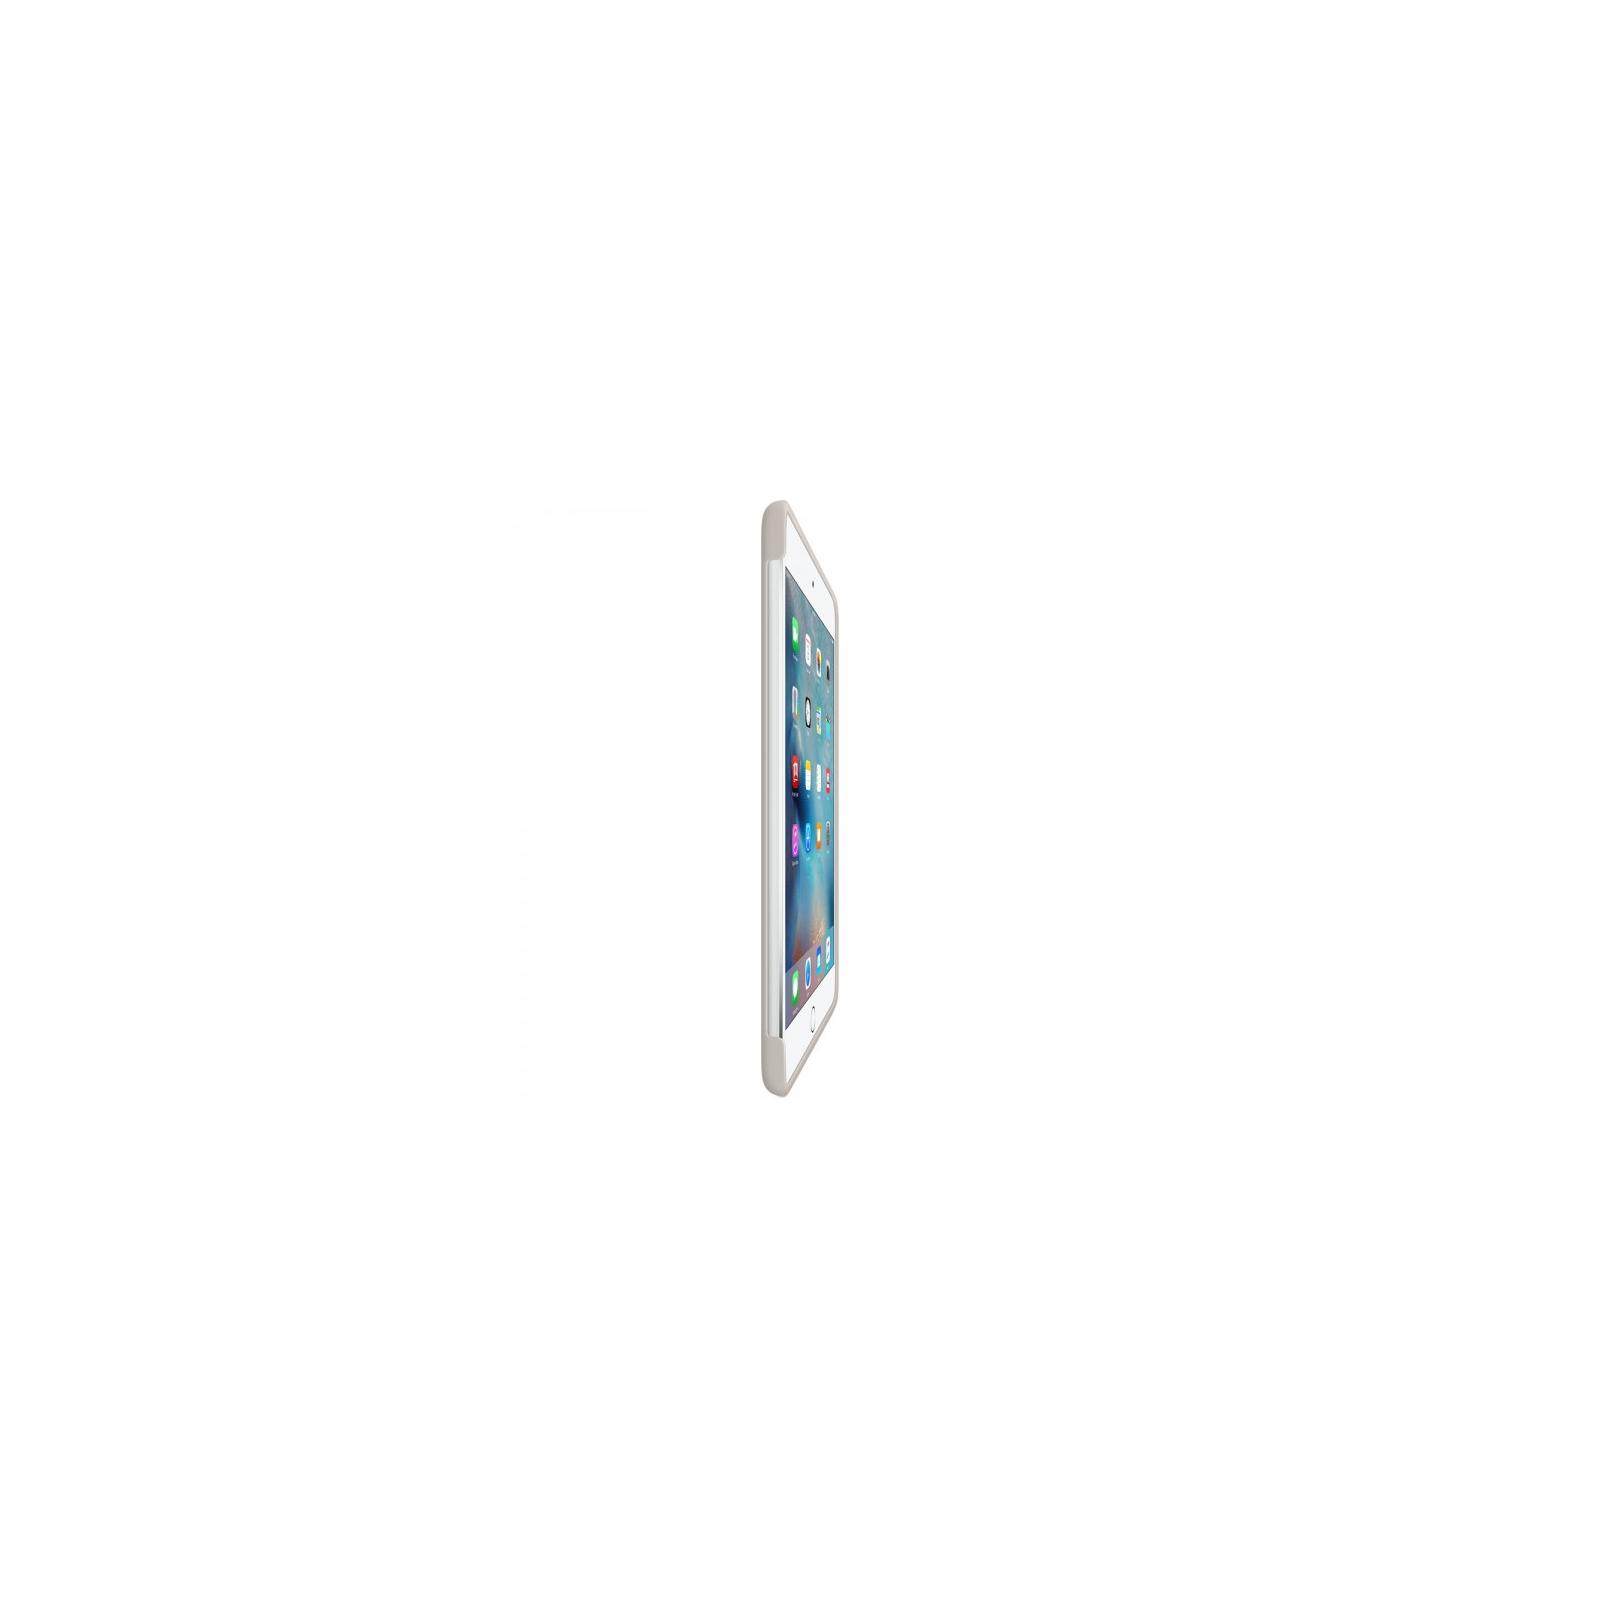 Чехол для планшета Apple iPad mini 4 Stone (MKLP2ZM/A) изображение 3